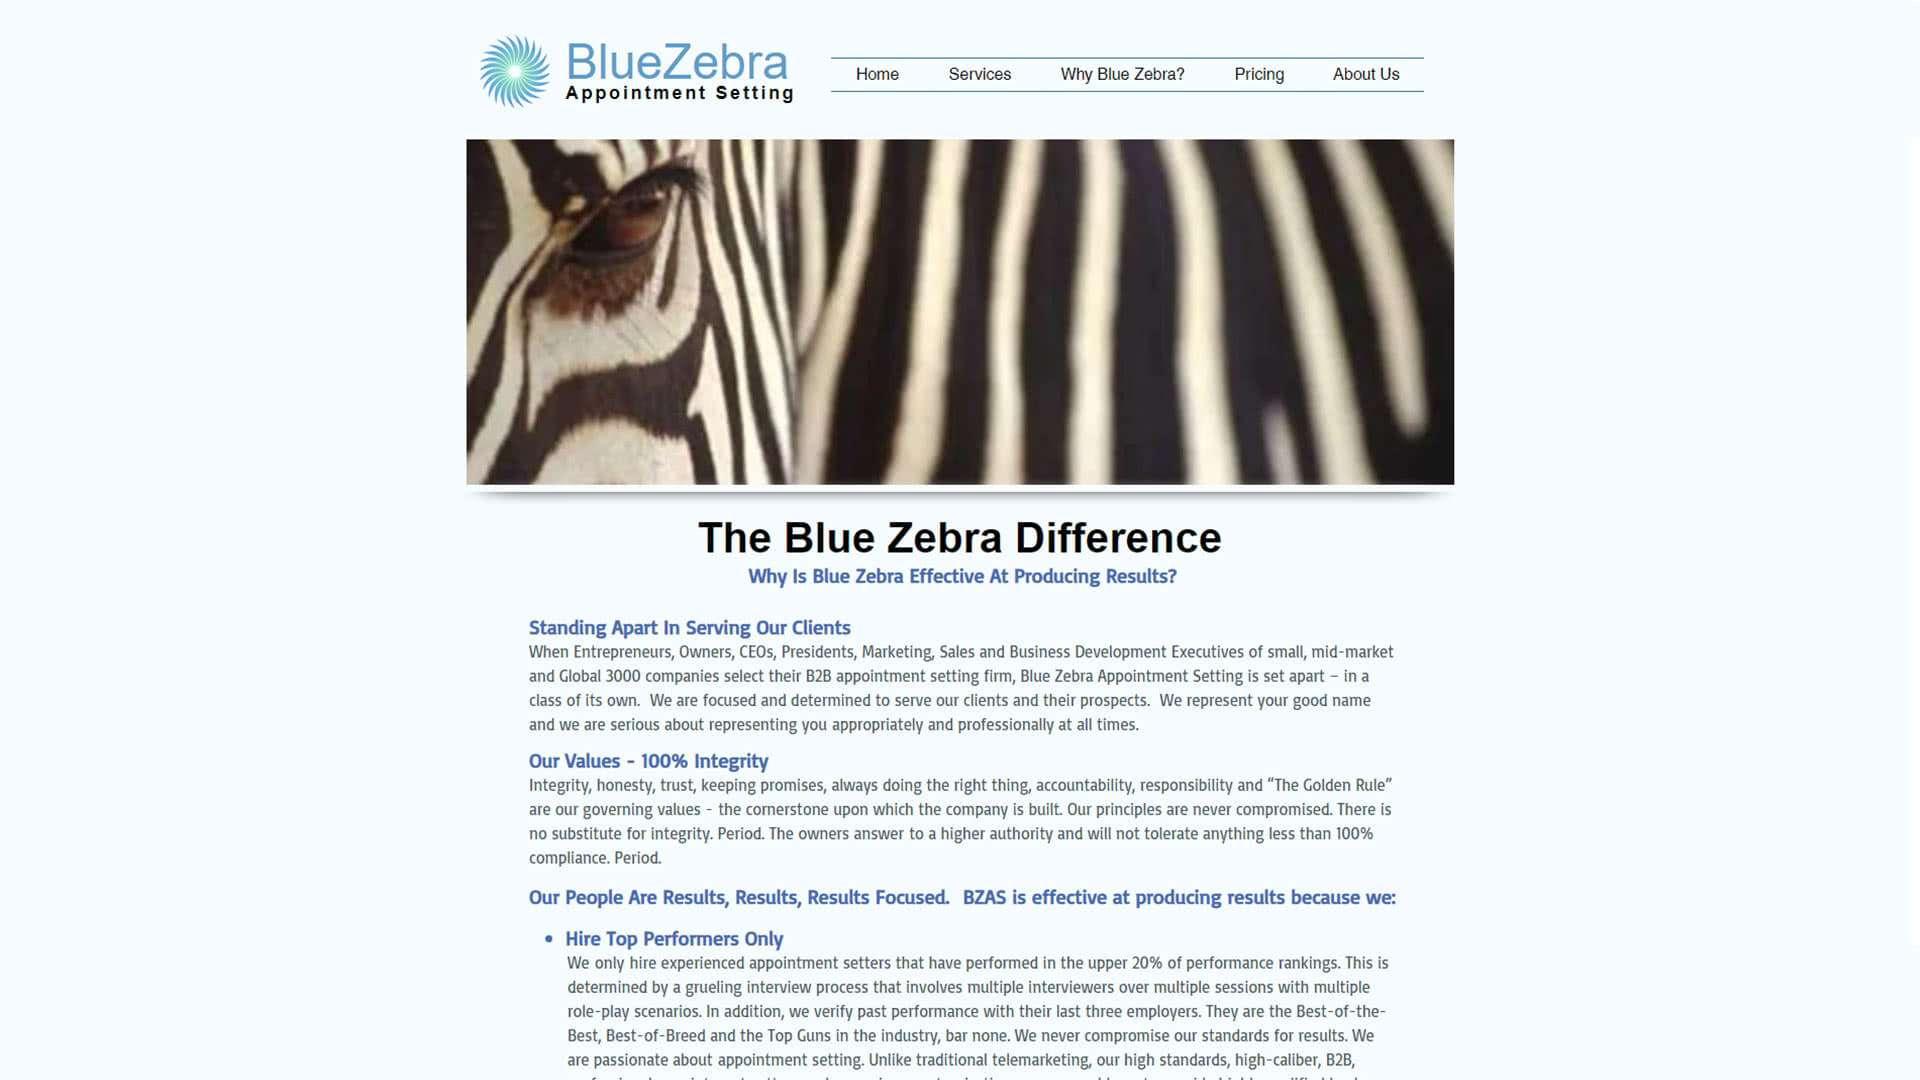 blue-zebra-appointment-setting-why-blue-zebra